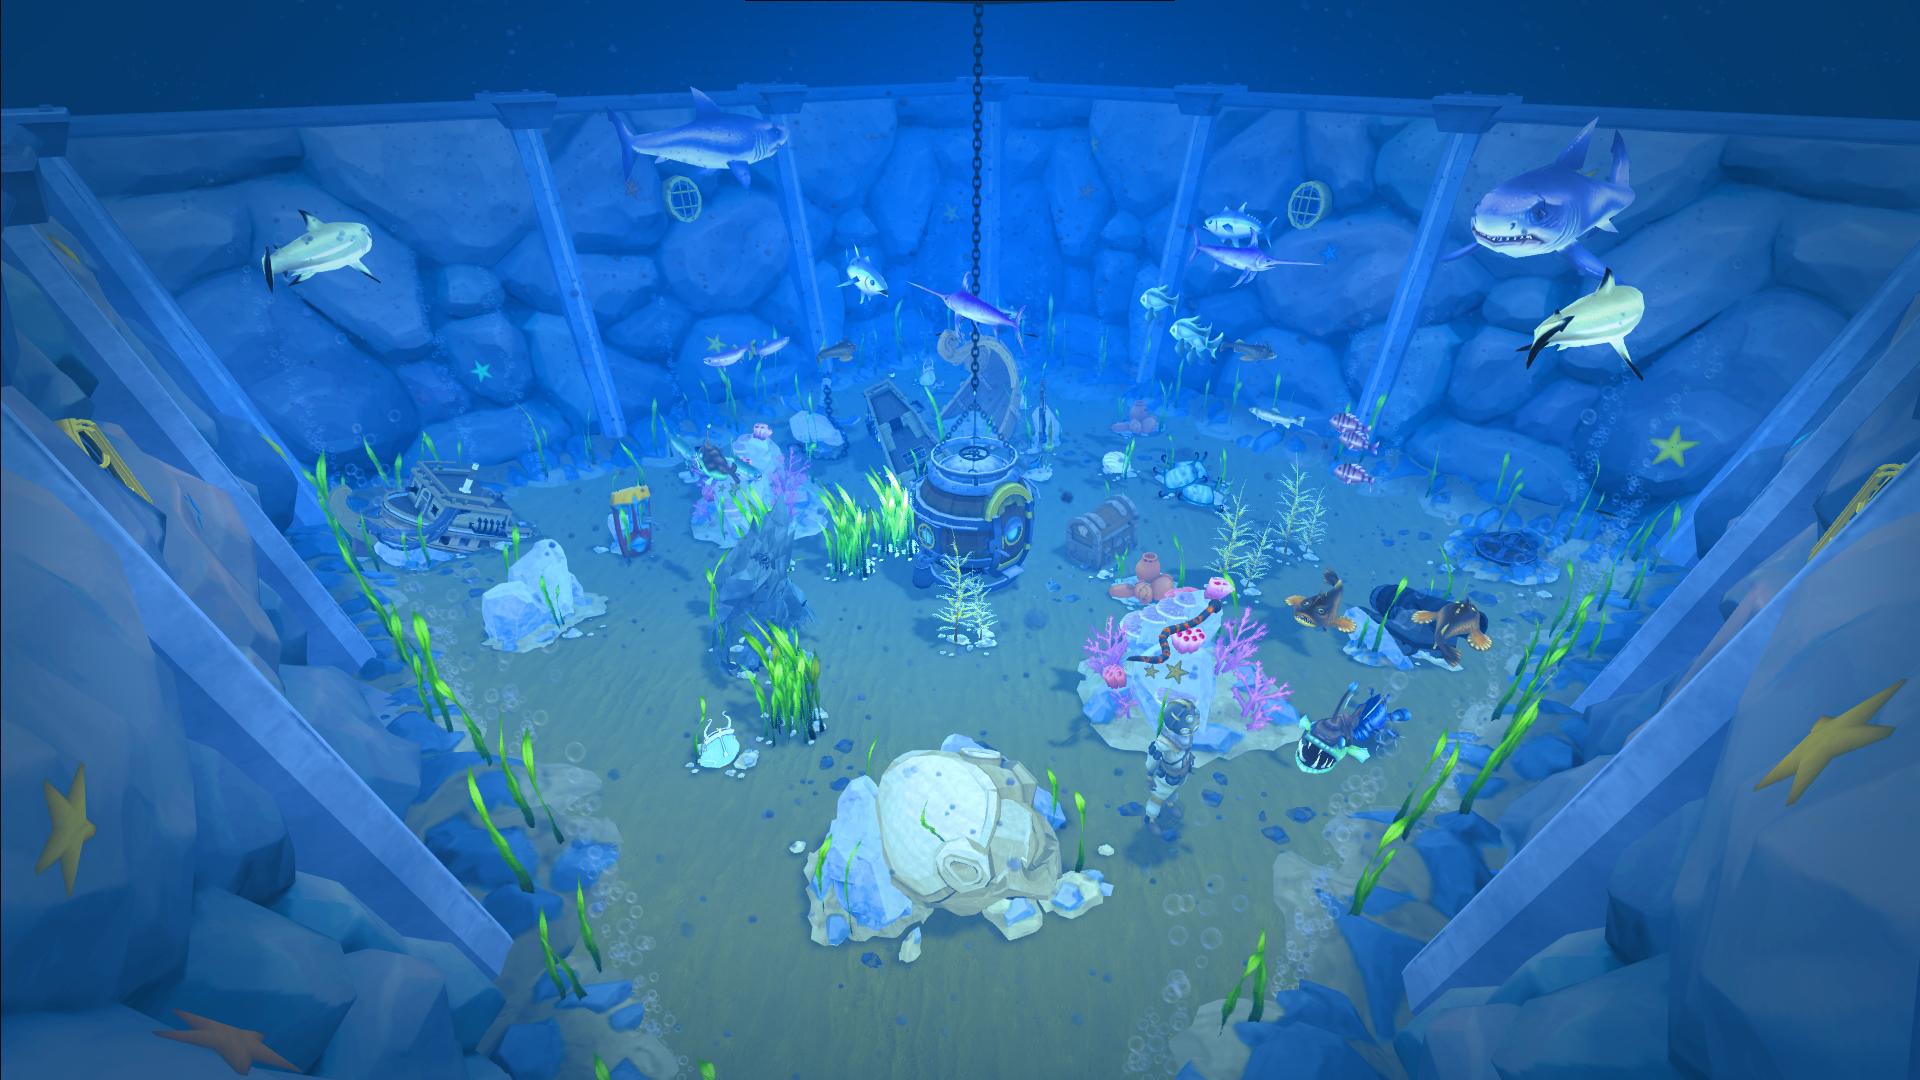 Fish in aquarium runescape - Image Aquarium Underwater Png Runescape Wiki Fandom Powered By Wikia